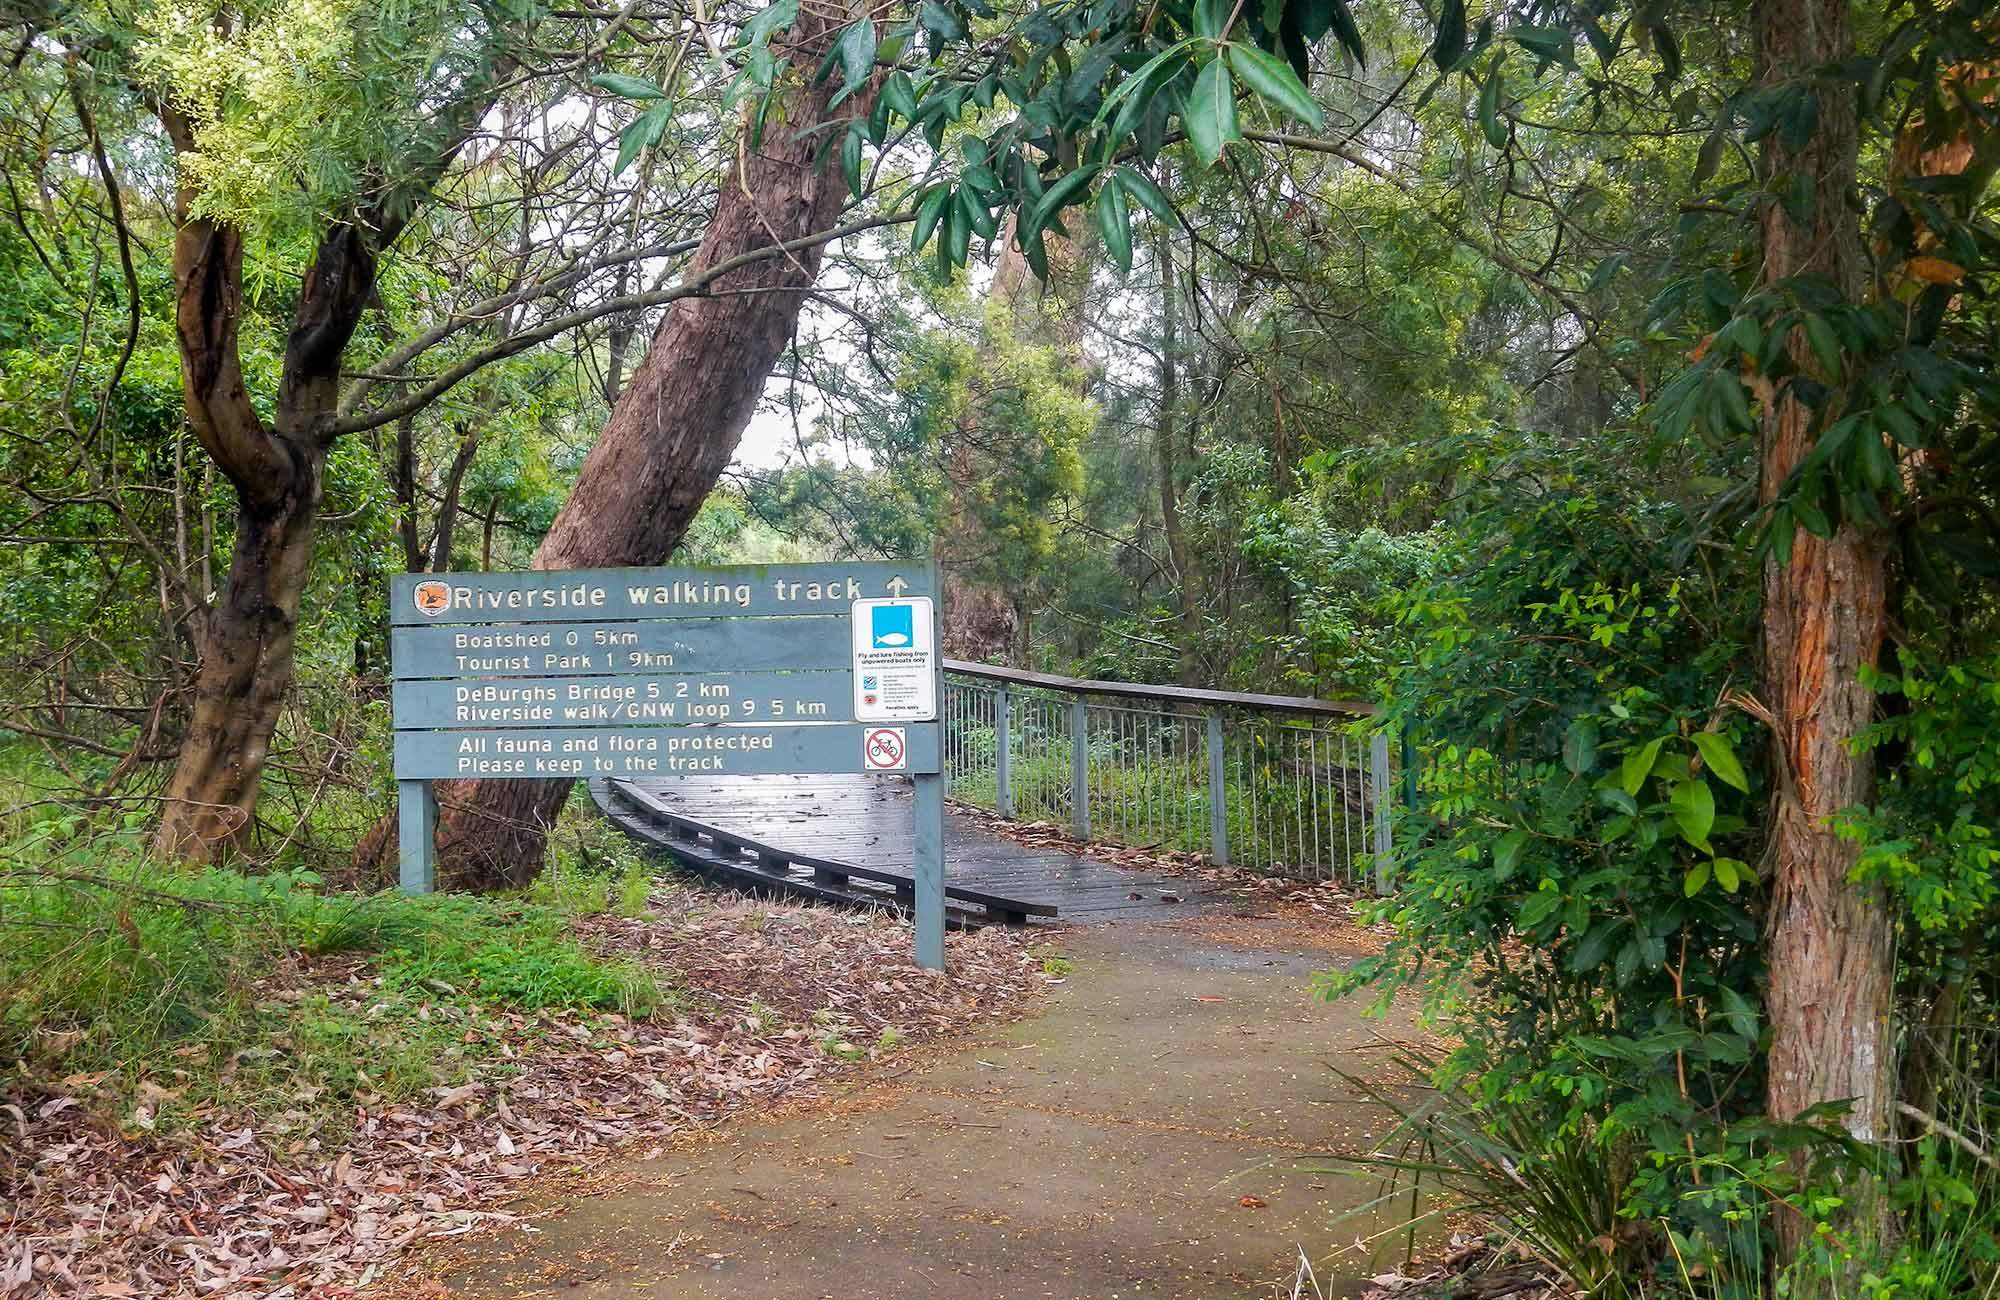 Riverside Walk, Lane Cove National Park